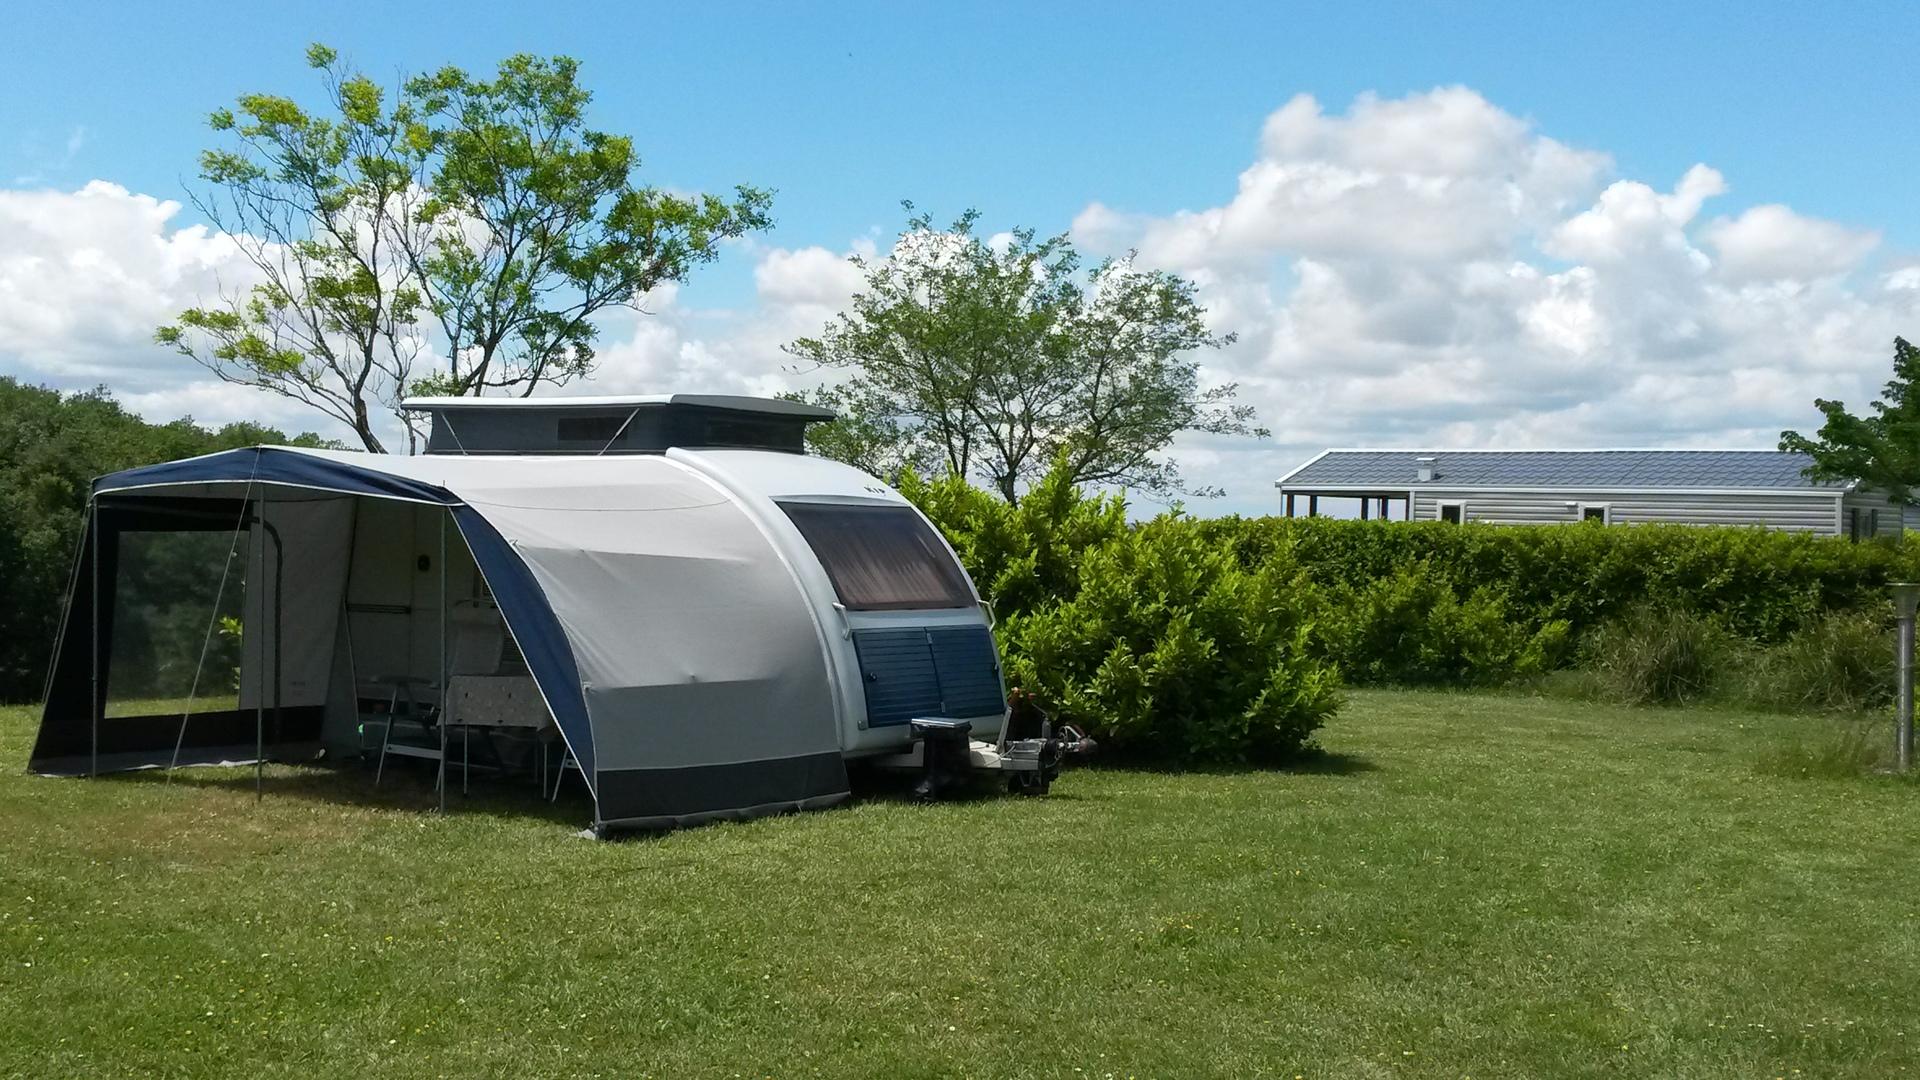 Frankrijk-Montferrand-Camping%20Domaine%20Saint%20Laurent-ExtraLarge Campings Frankrijk